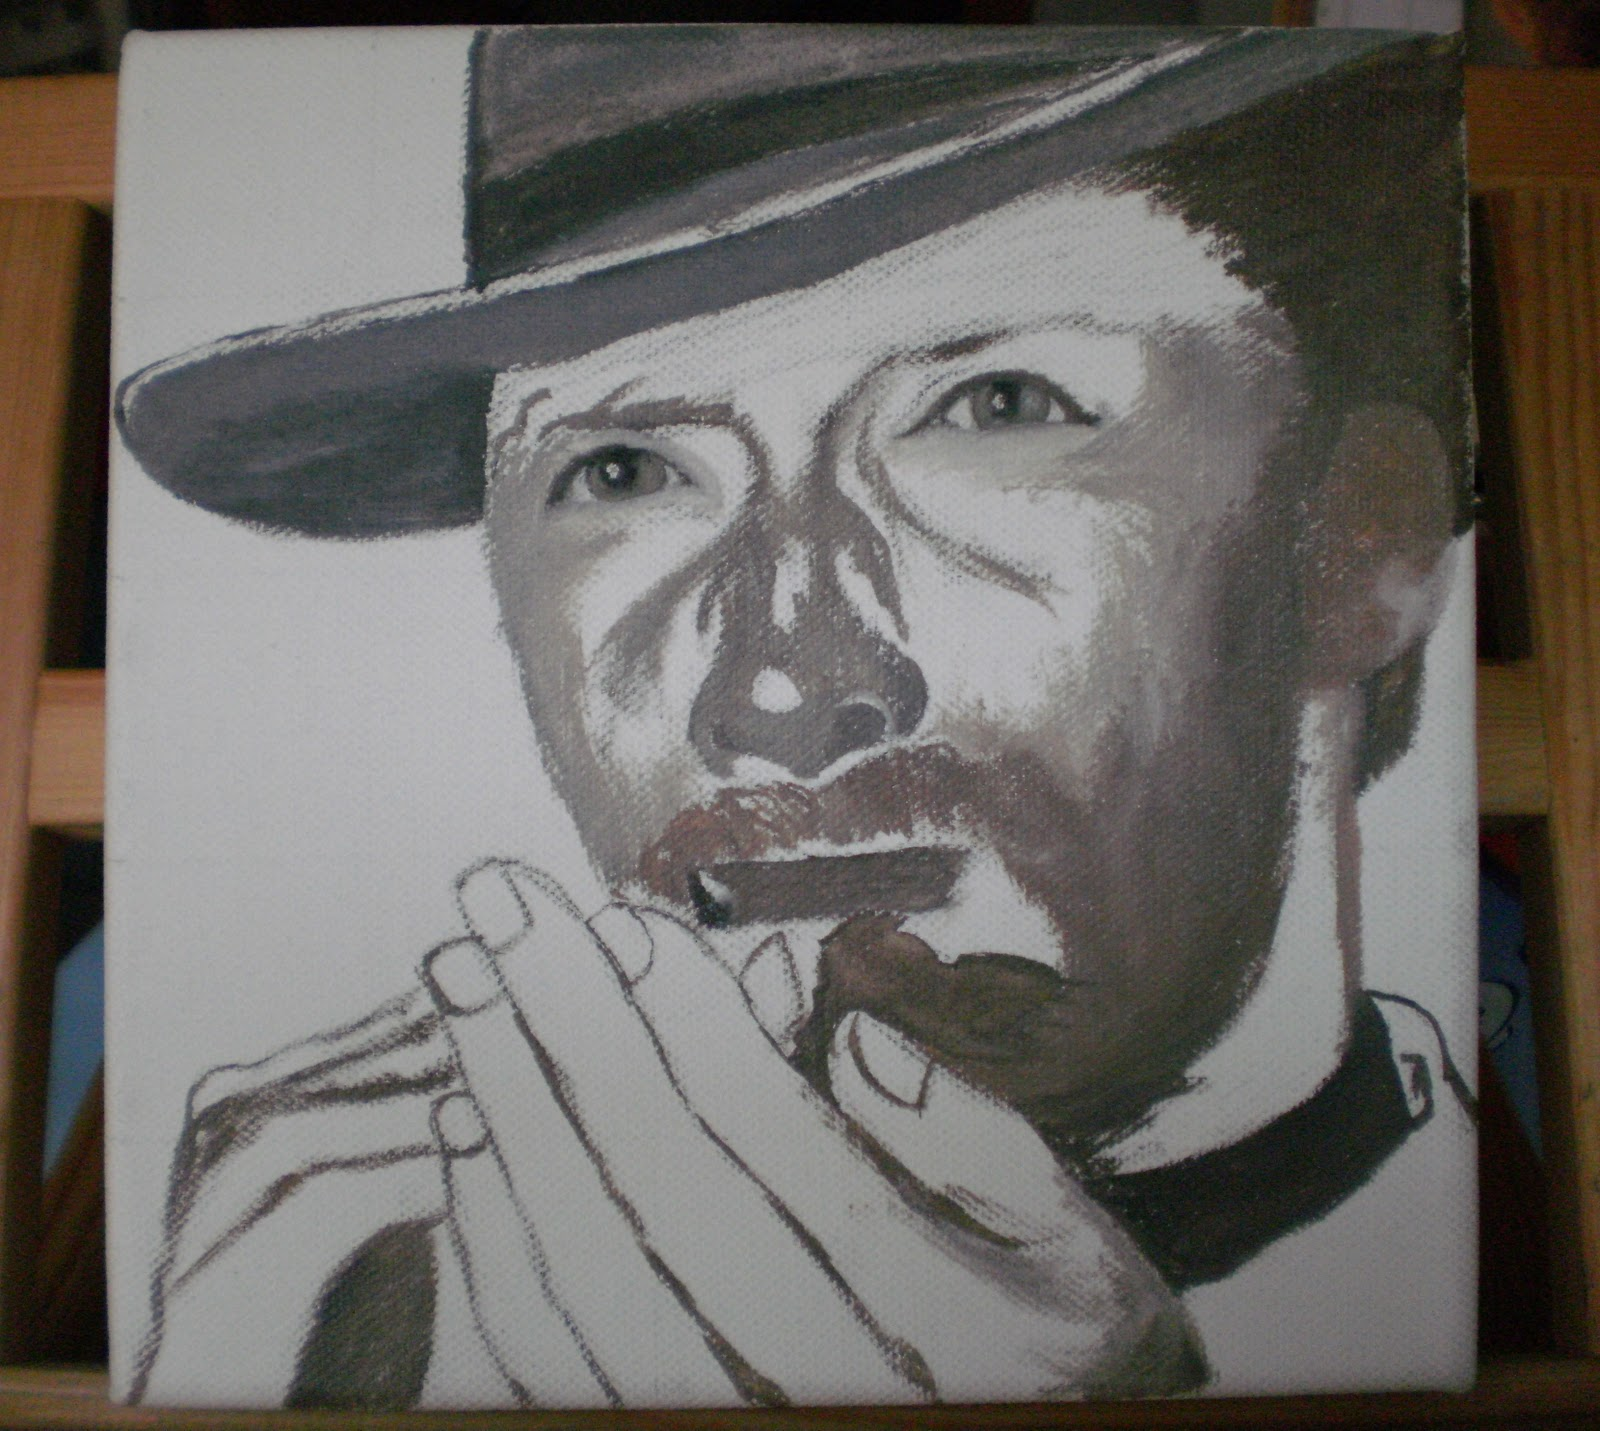 Pinturas al leo nistal lorenzo como pintar un retrato - Retrato oleo paso a paso ...